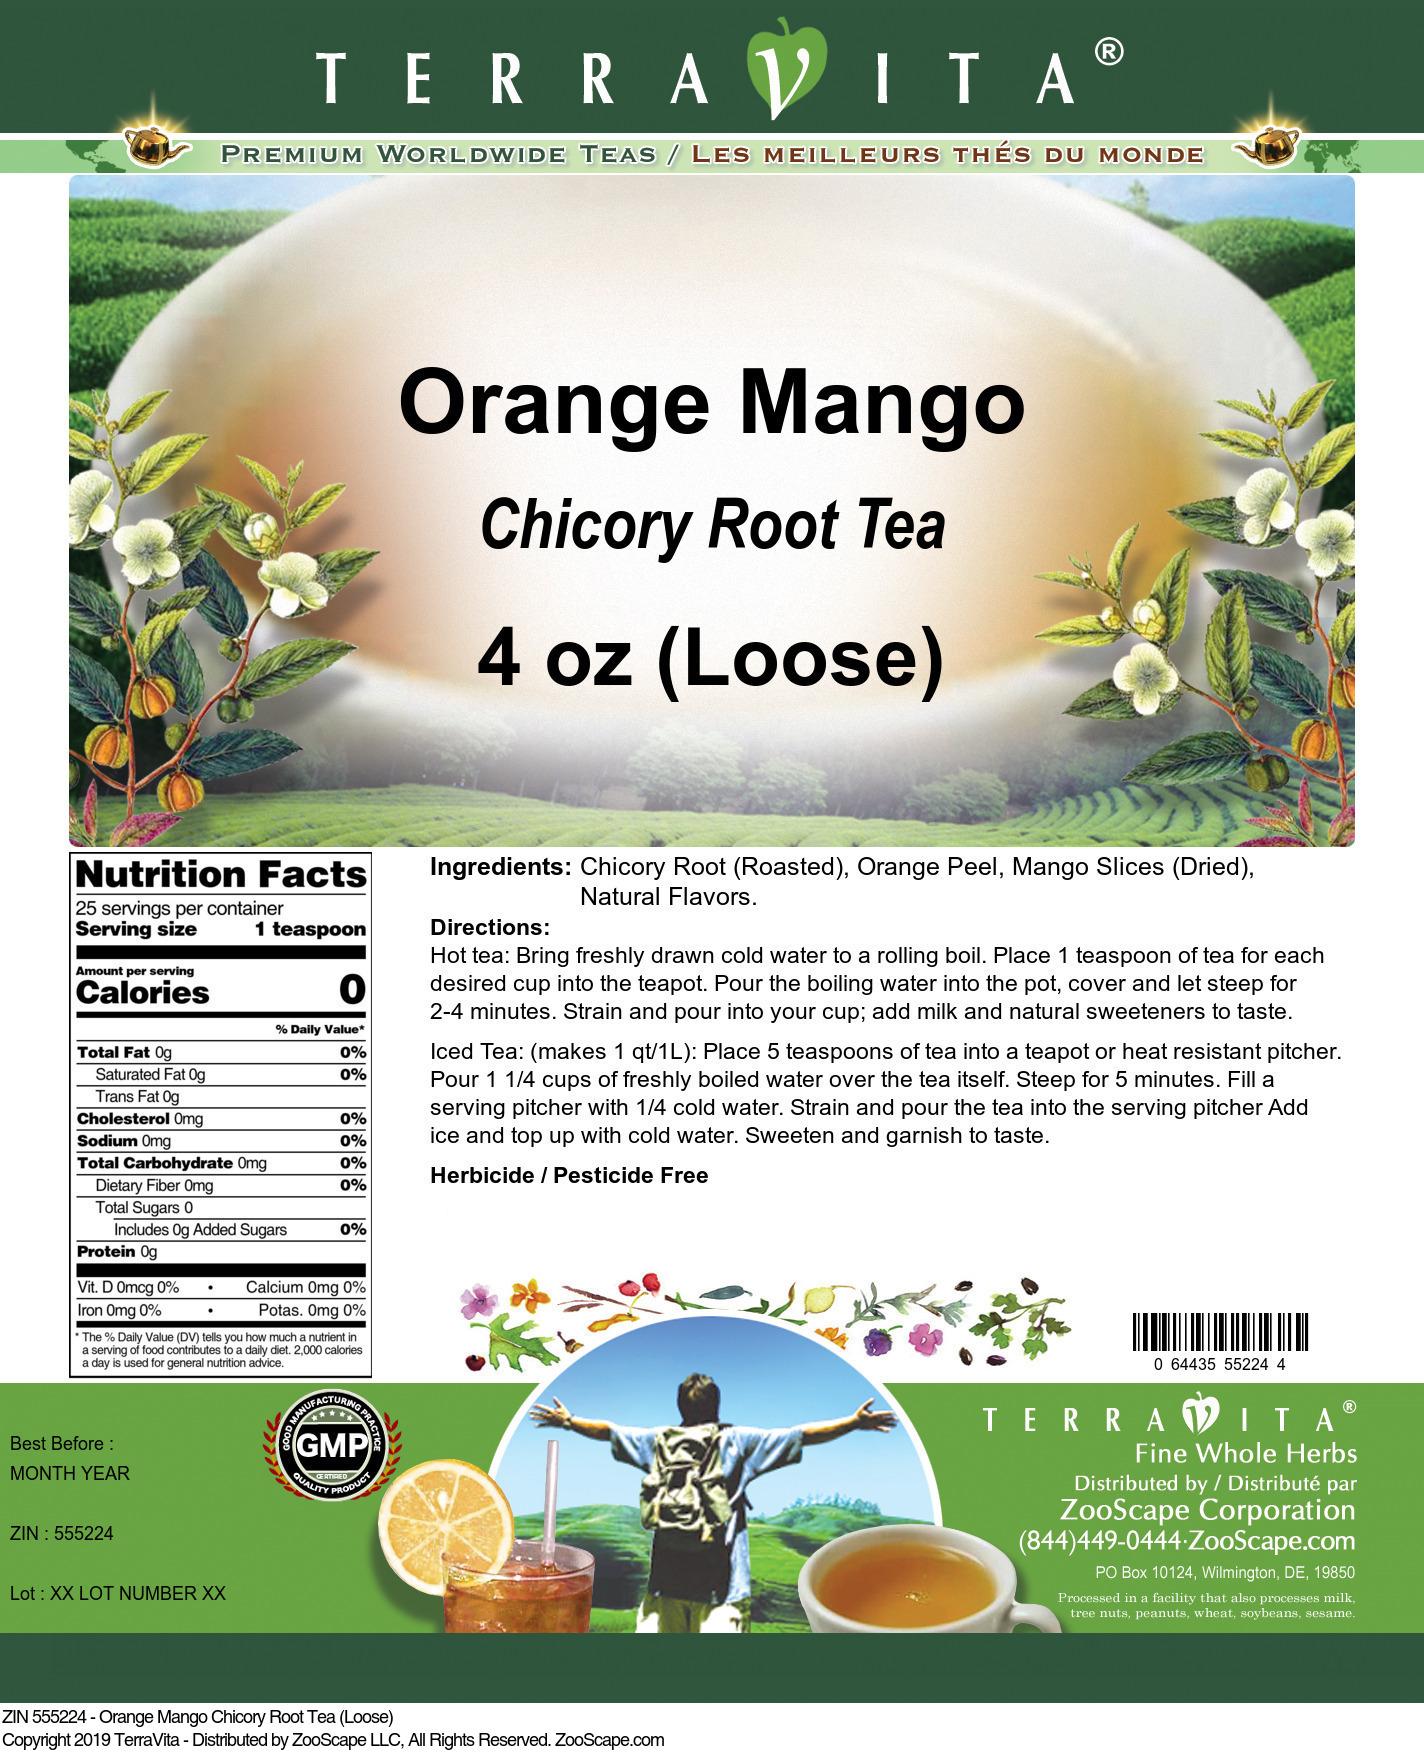 Orange Mango Chicory Root Tea (Loose)